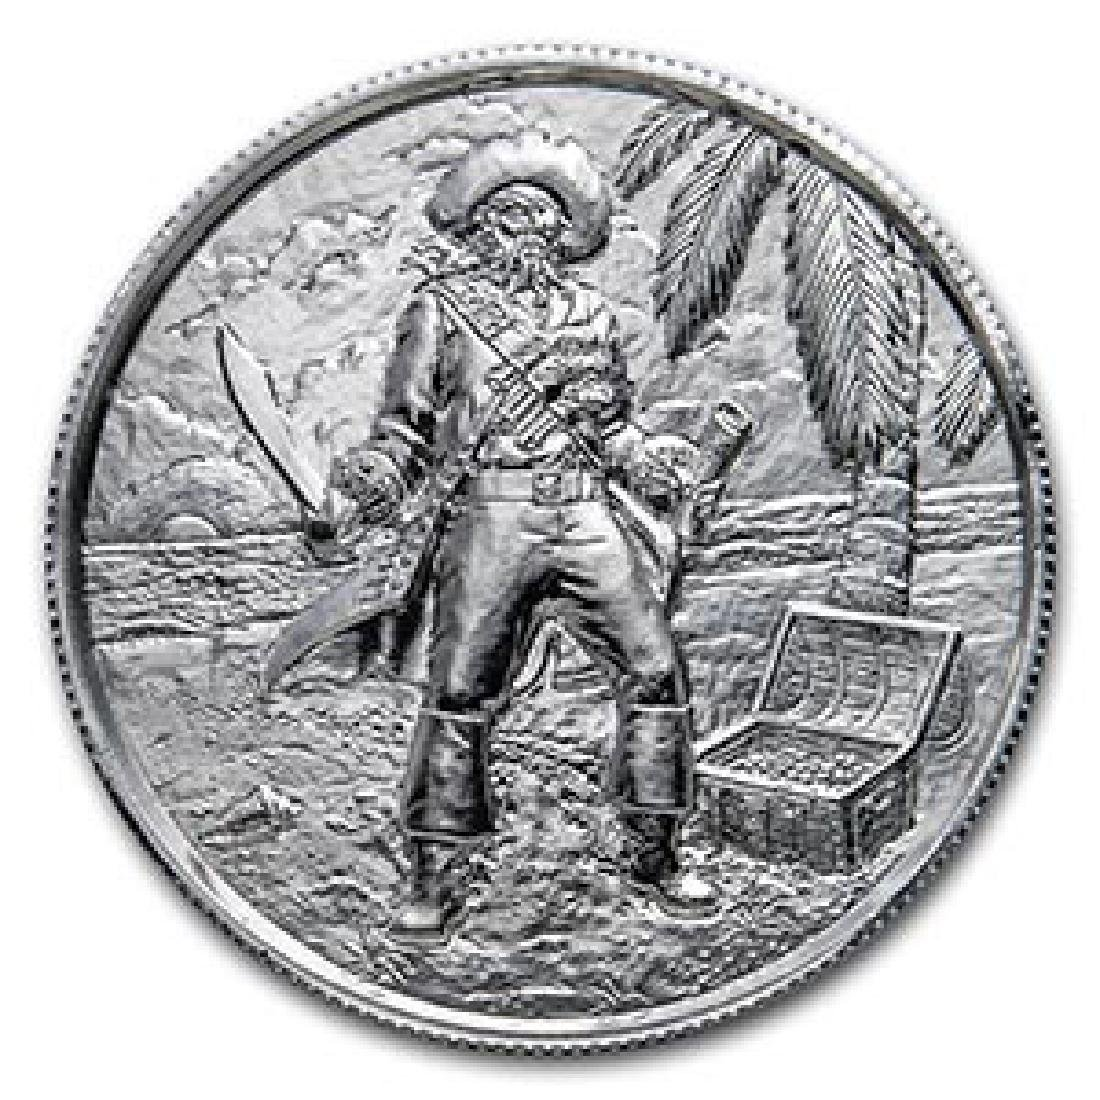 2 oz Silver Round - The Captain